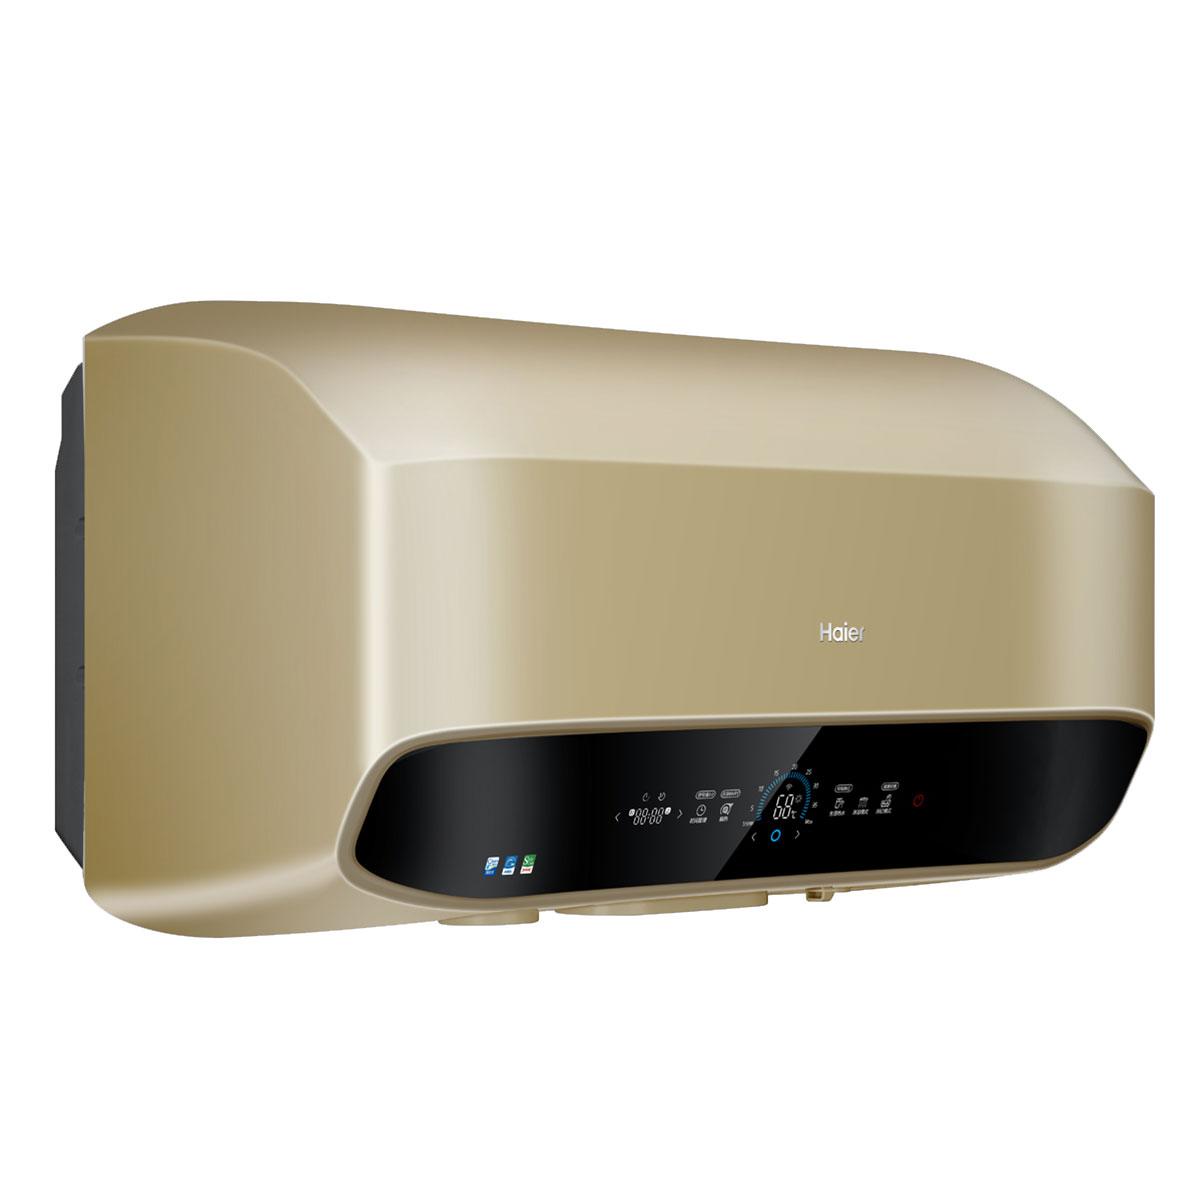 Haier/海尔                         电热水器                         ES80H-PLUS9(U1)